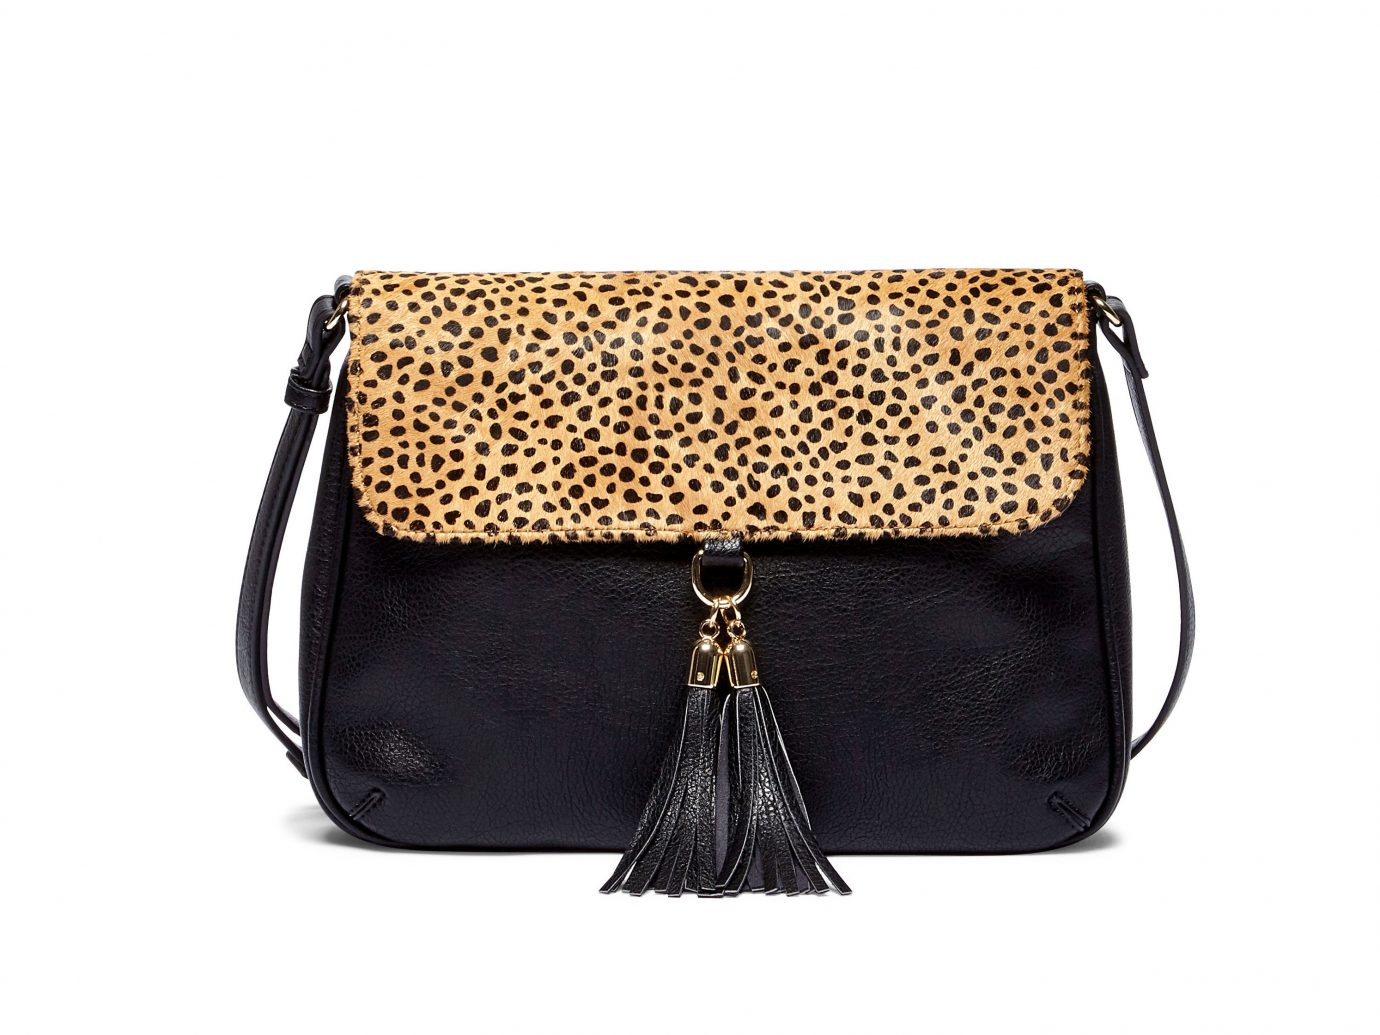 Style + Design handbag bag sitting shoulder bag piece leather accessory fashion accessory pattern case